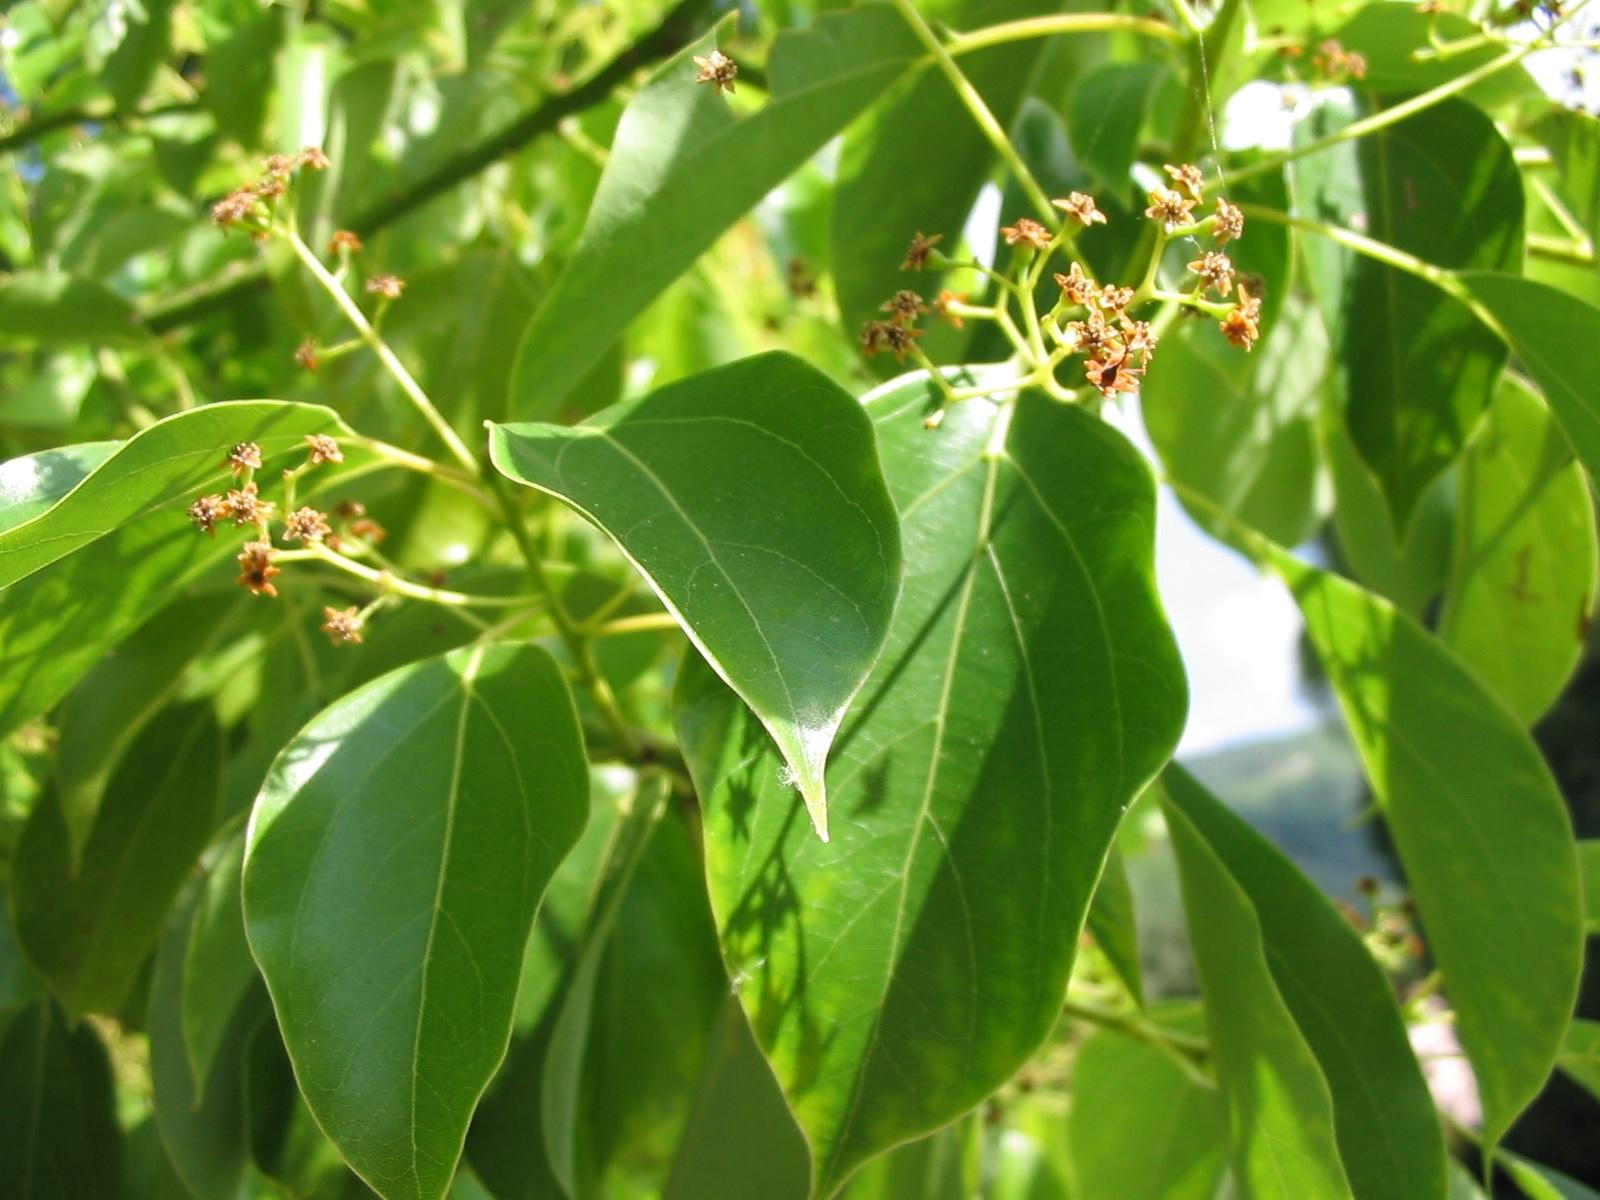 Le Ravintsara, aussi appelé Camphrier de Madagascar, aussi appelé Cinnamomum camphora cineoliferum (trop facile).